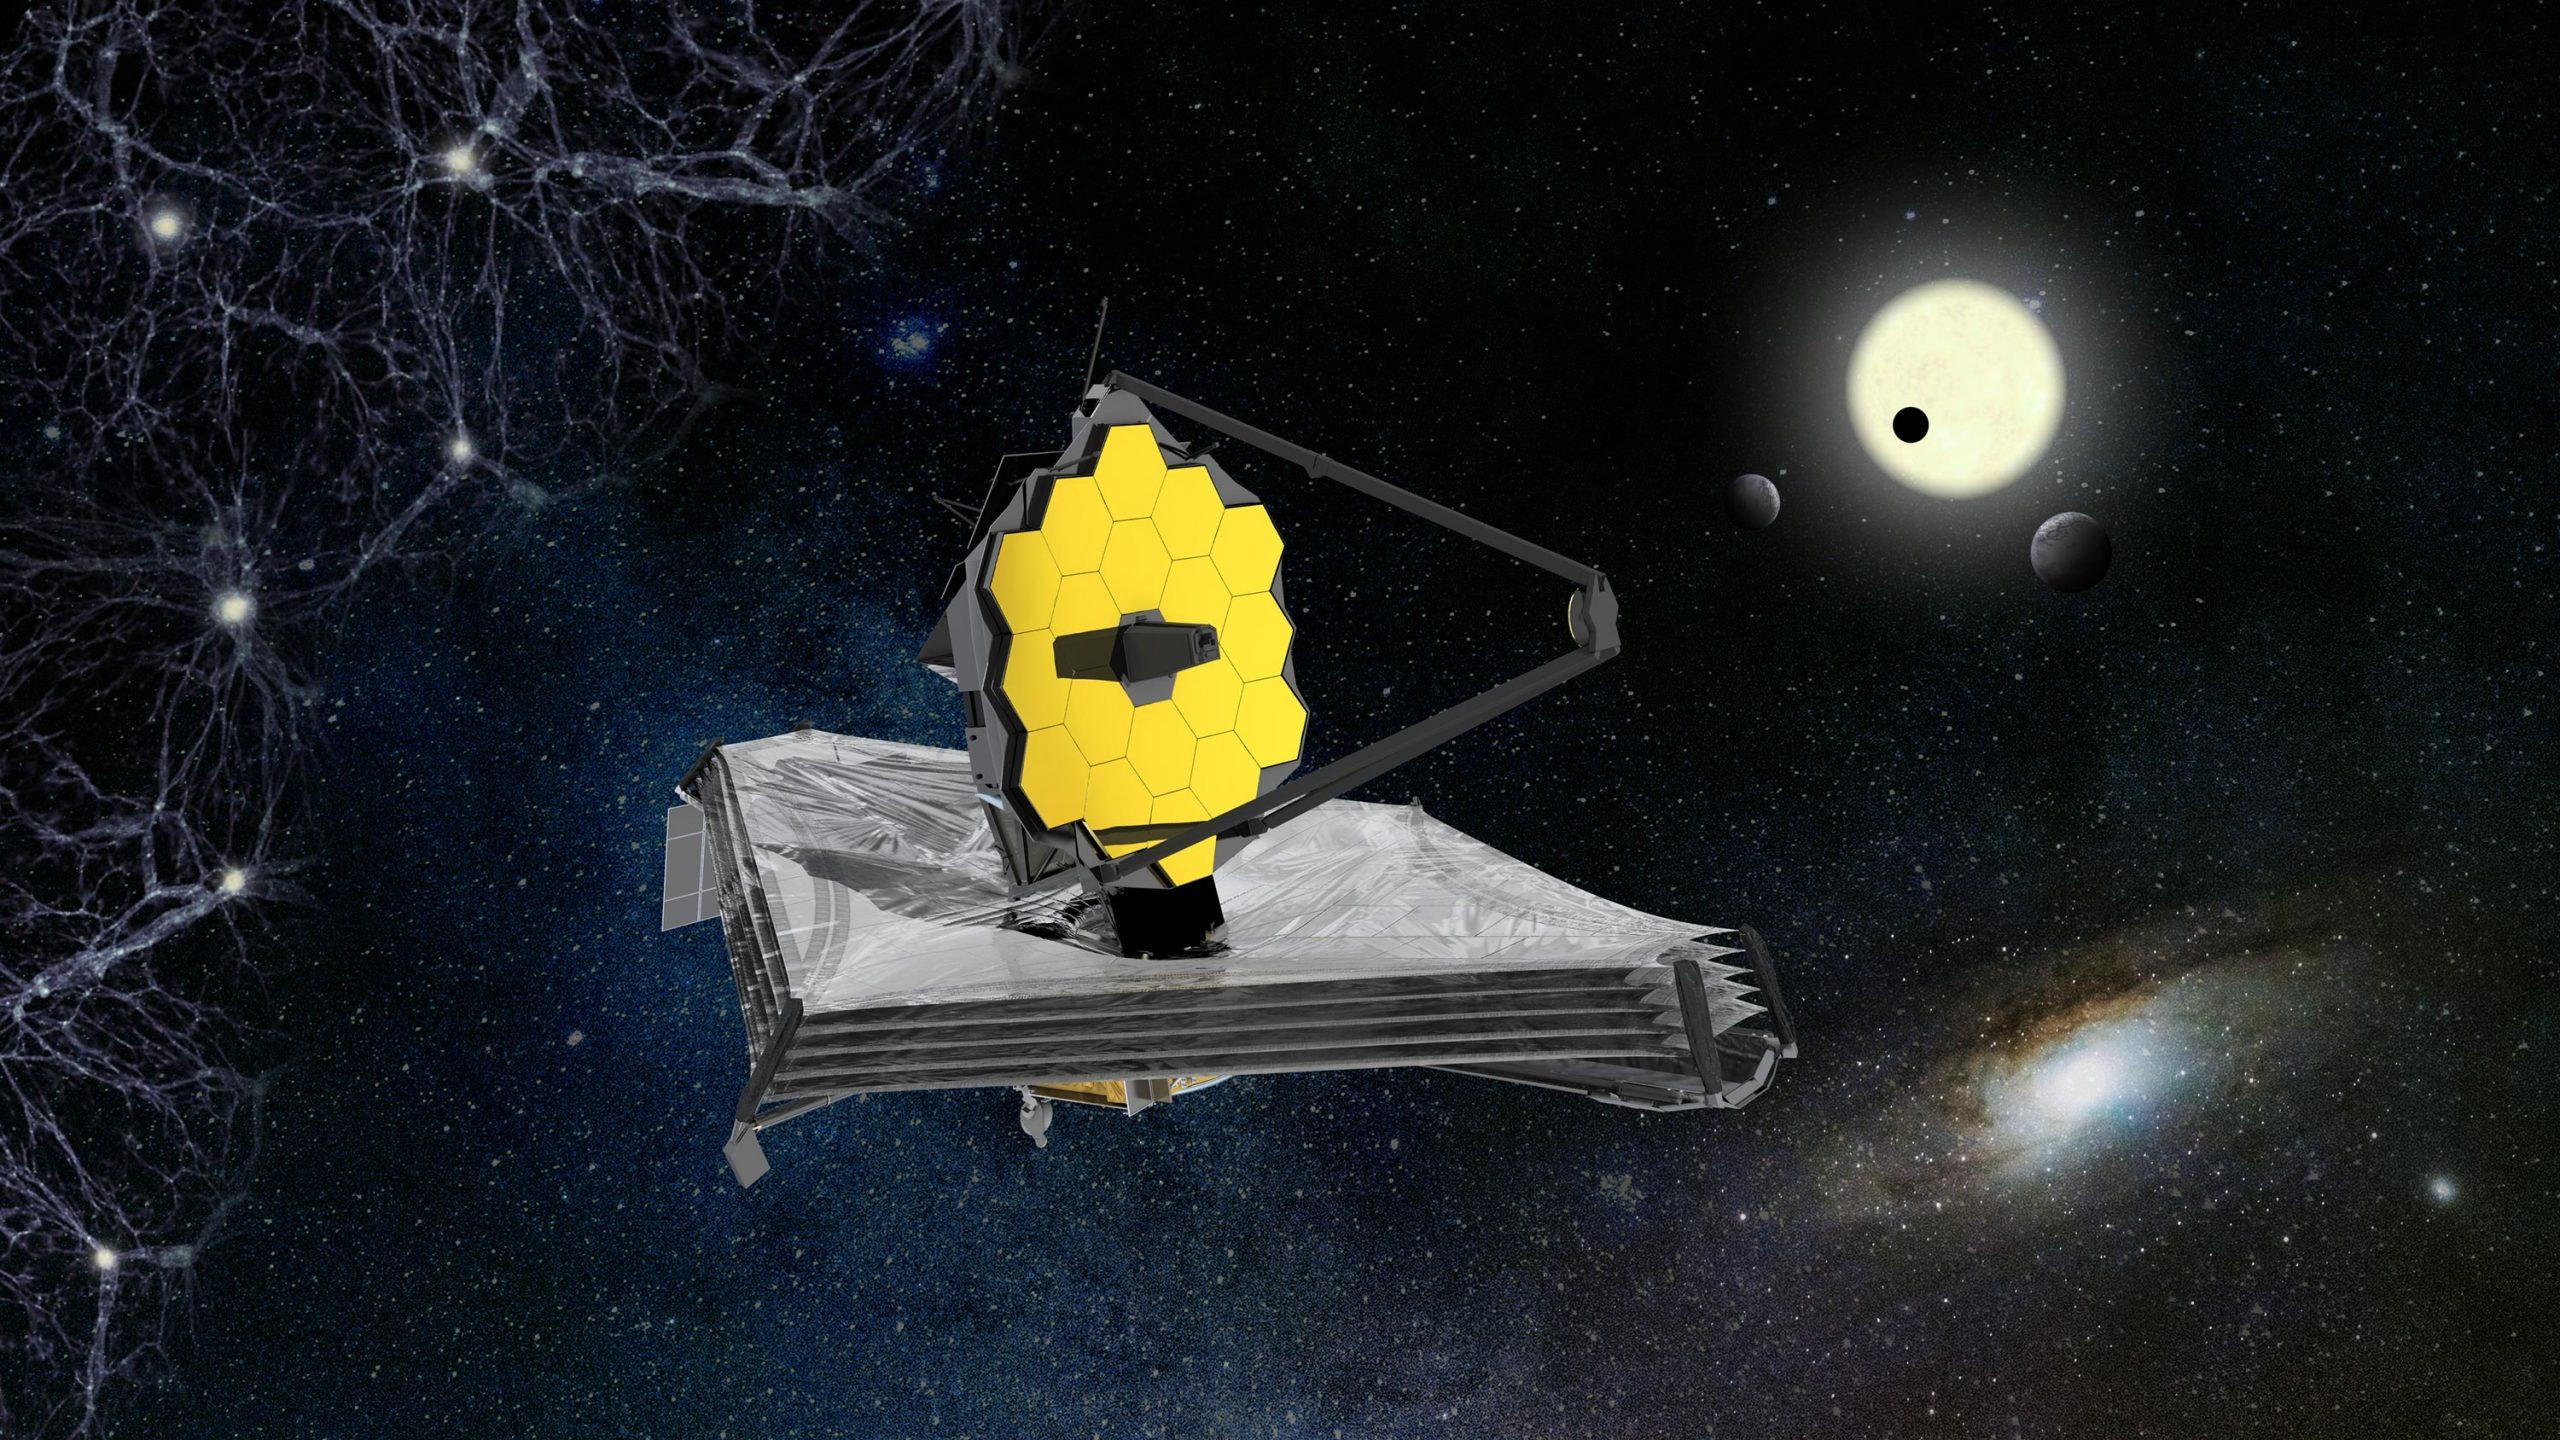 James Webb Space Telescope Artists Impression scaled